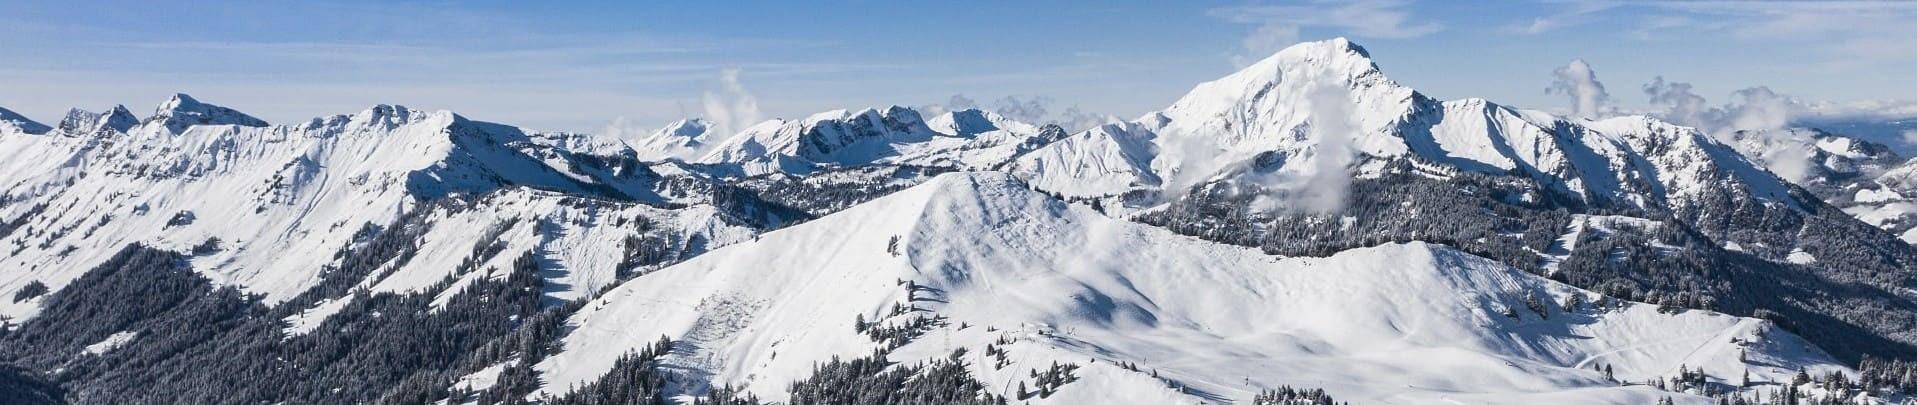 Winter view over Le Mont de Grange from Châtel